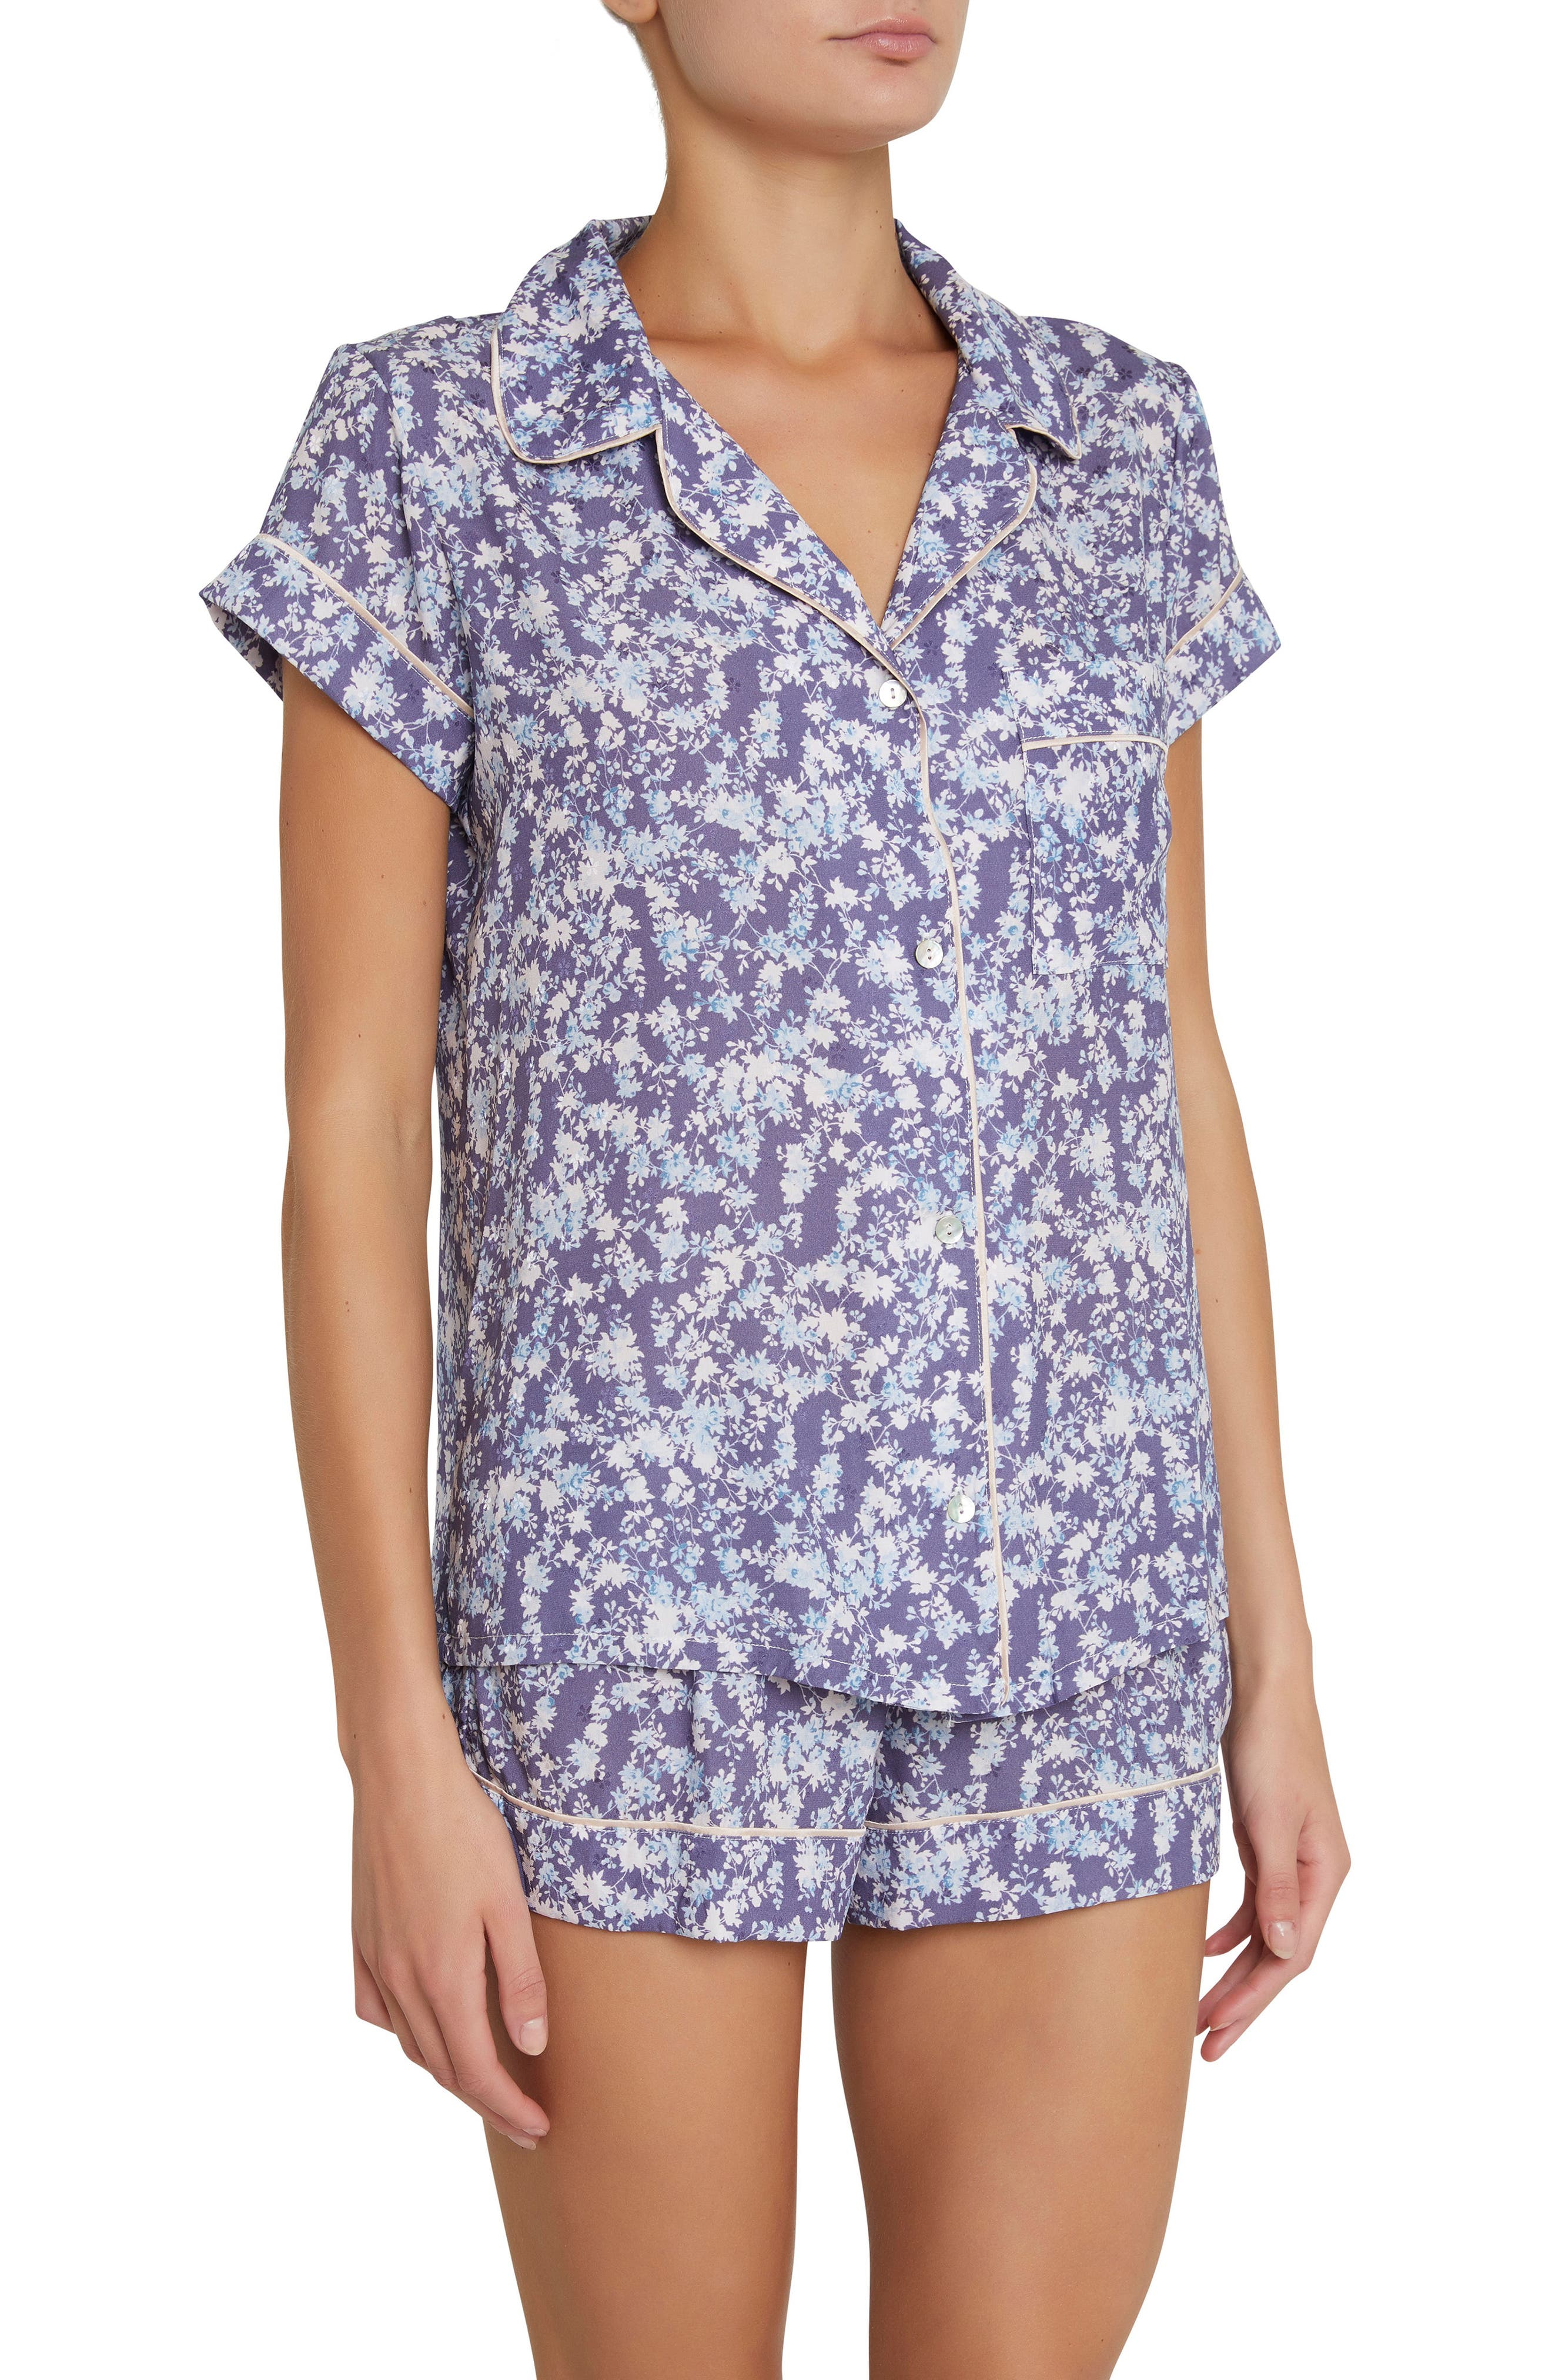 Lily Short Pajamas,                         Main,                         color, Blue Floral Print